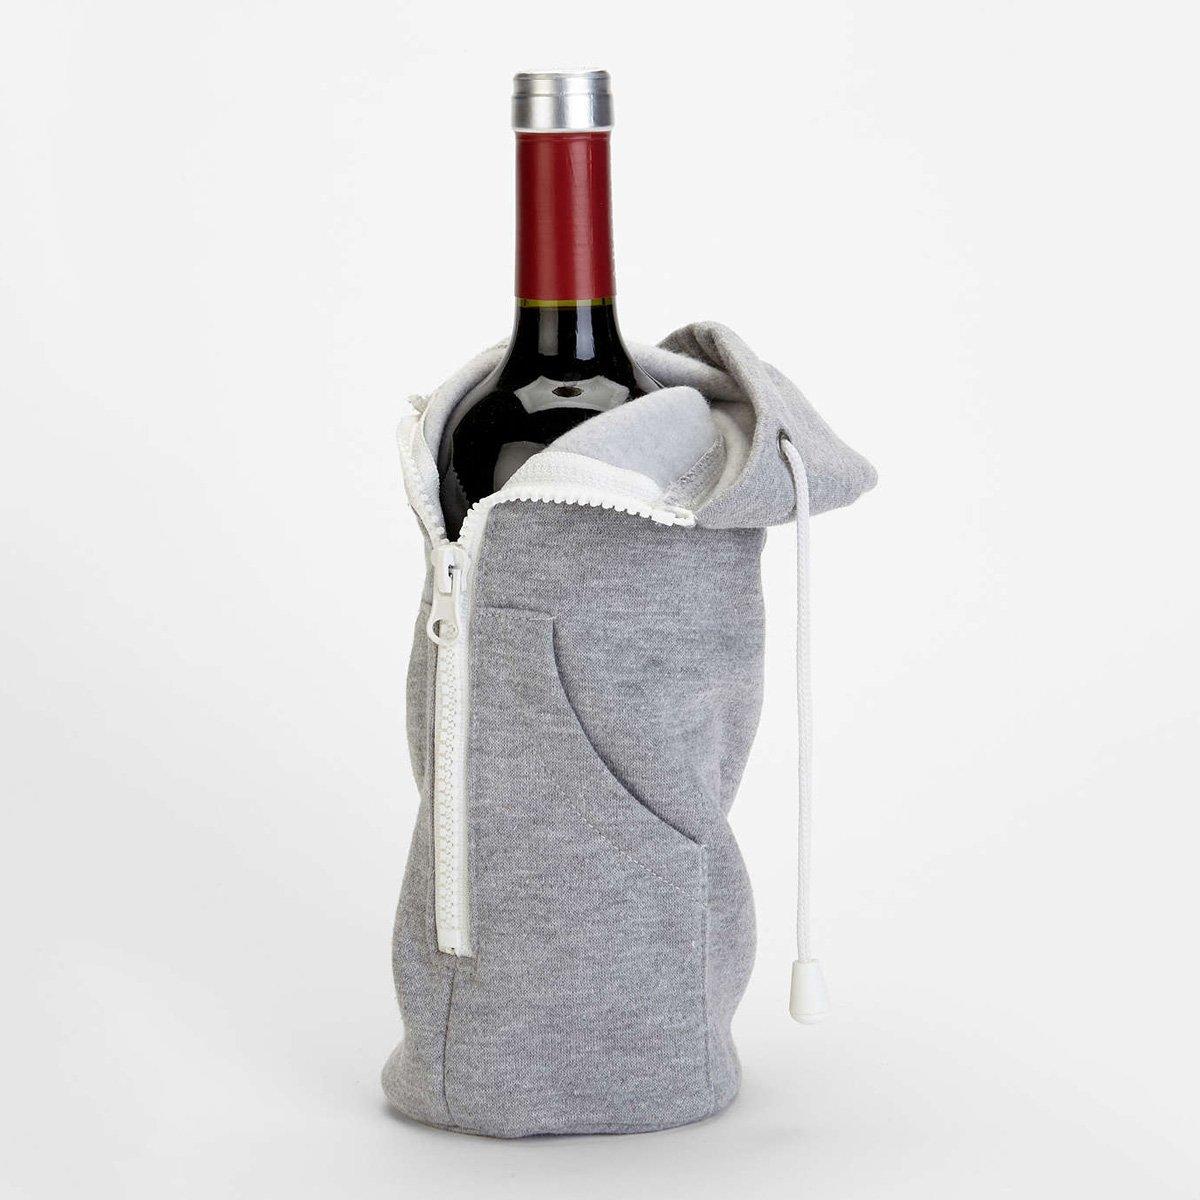 Wine Bottle Hoodie Sweatshirt - The Green Head